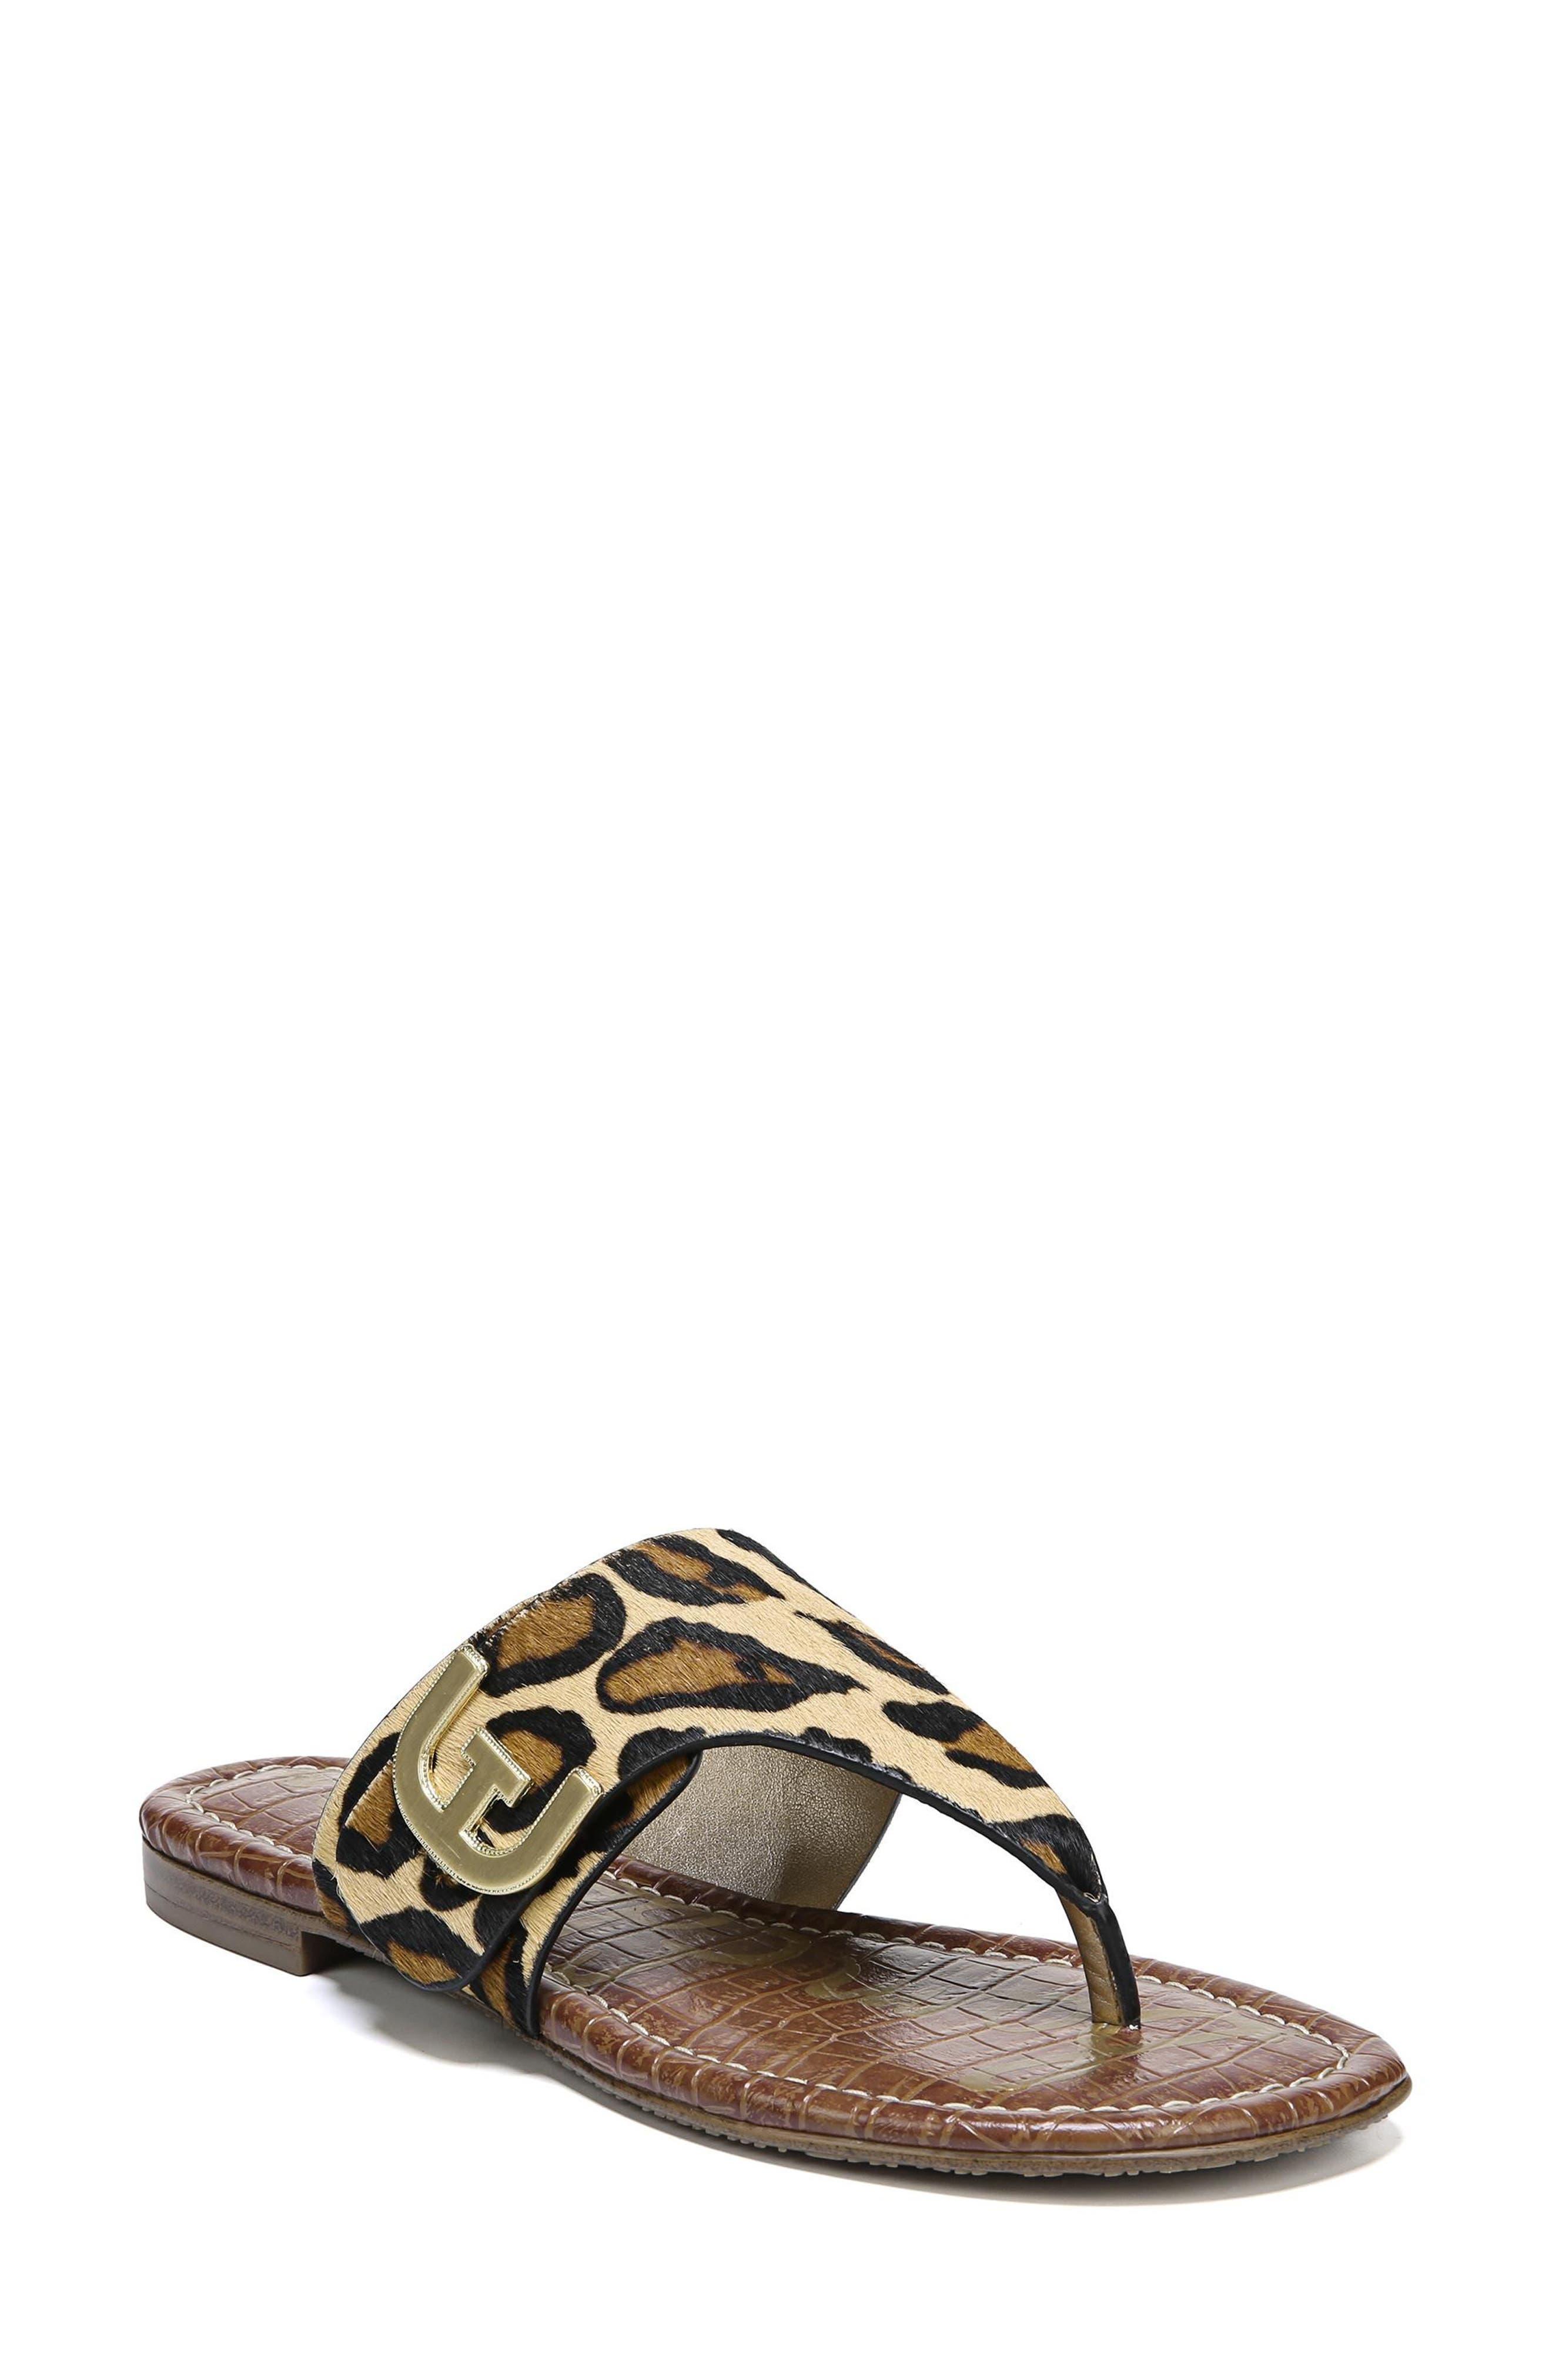 Barry Genuine Calf Hair V-Strap Sandal,                             Main thumbnail 1, color,                             New Nude Leopard Brahma Hair